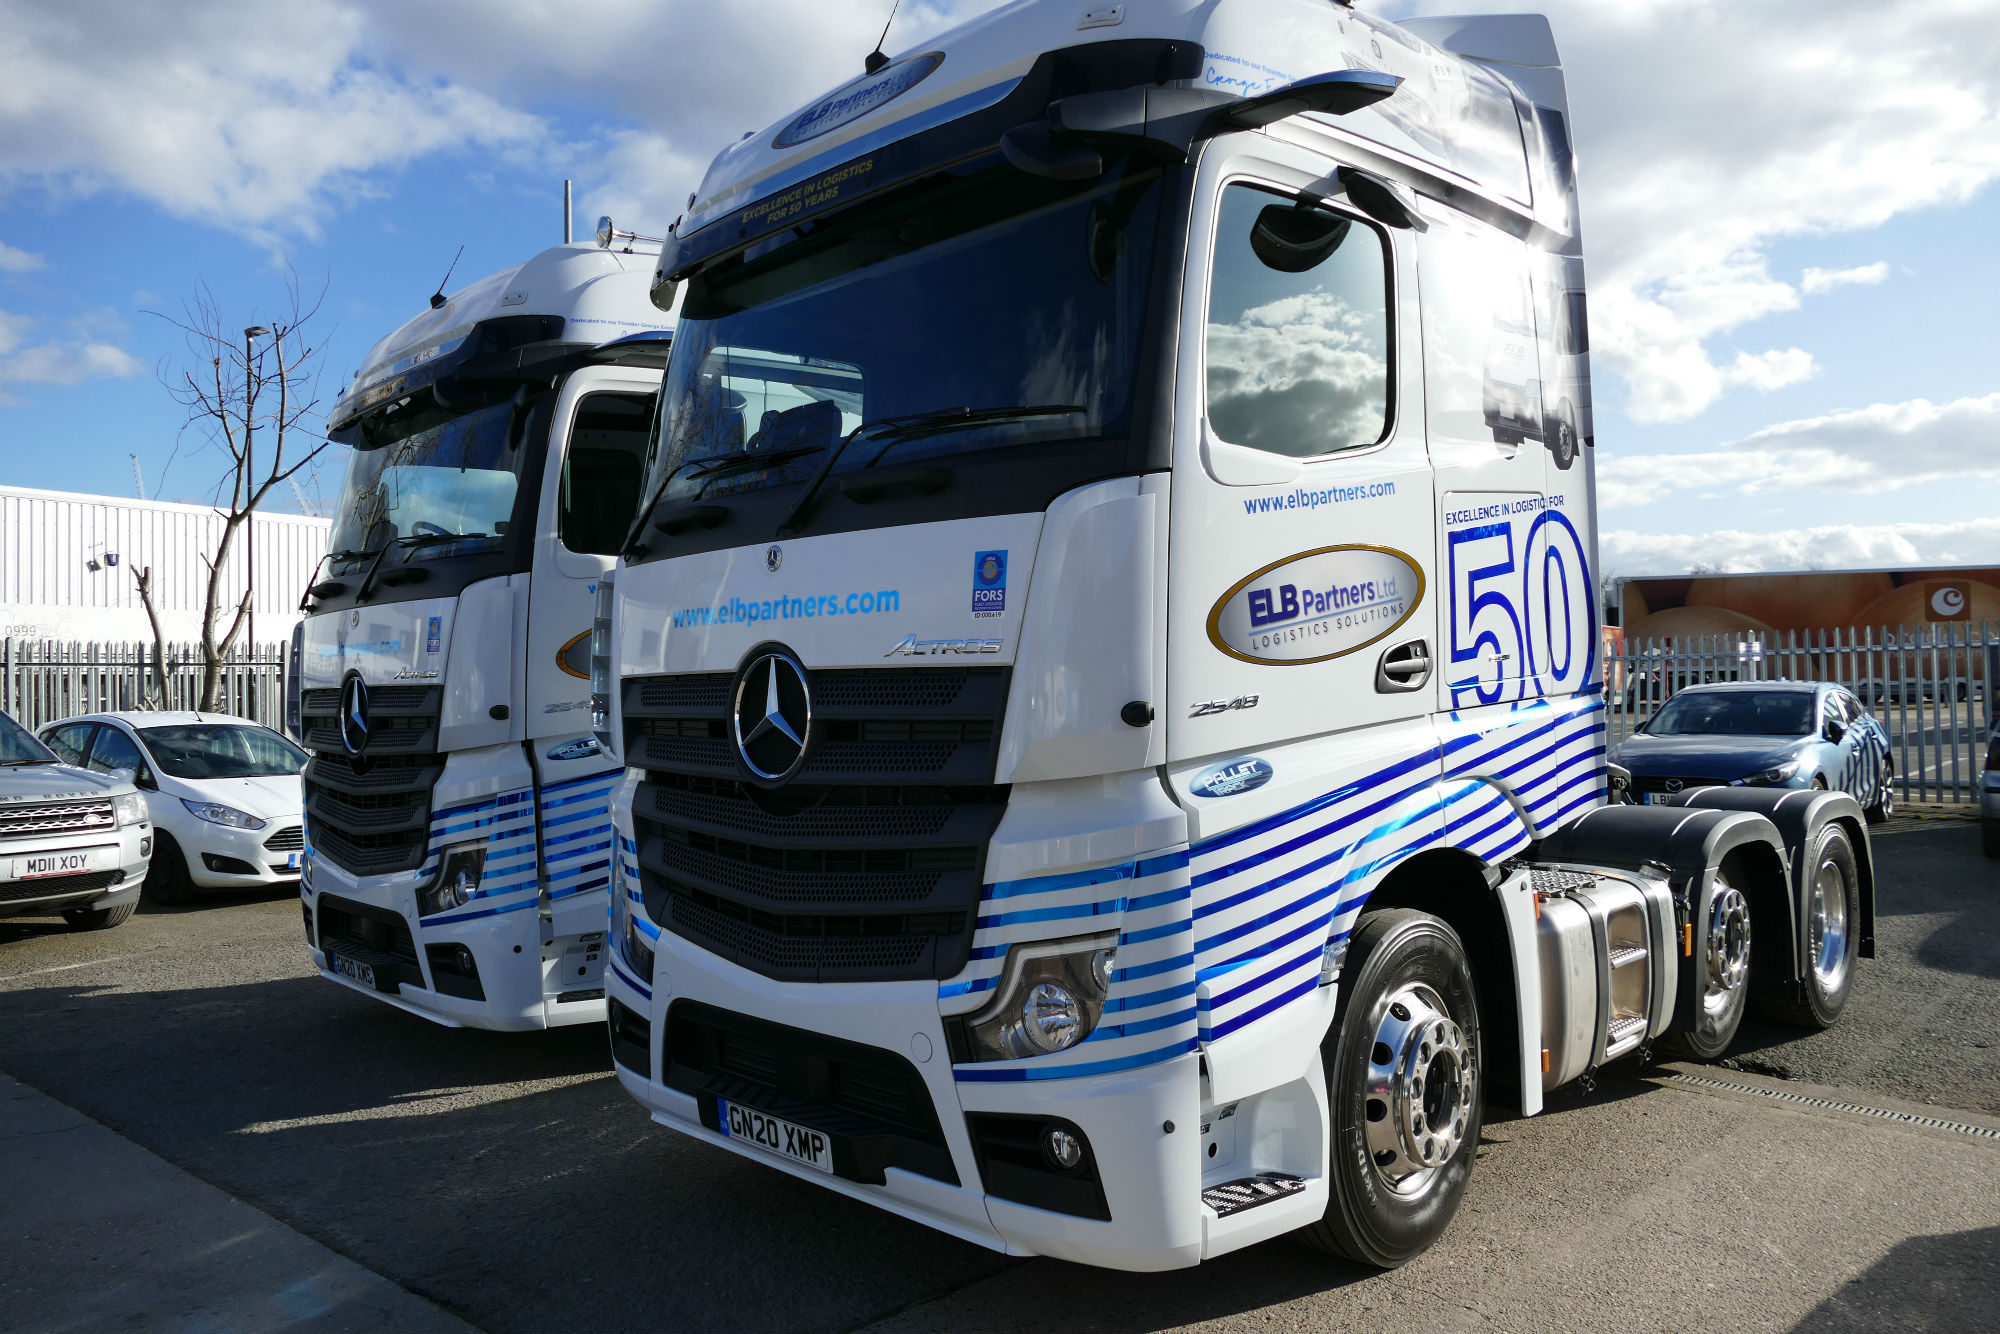 ELB Partners 50th anniversary trucks